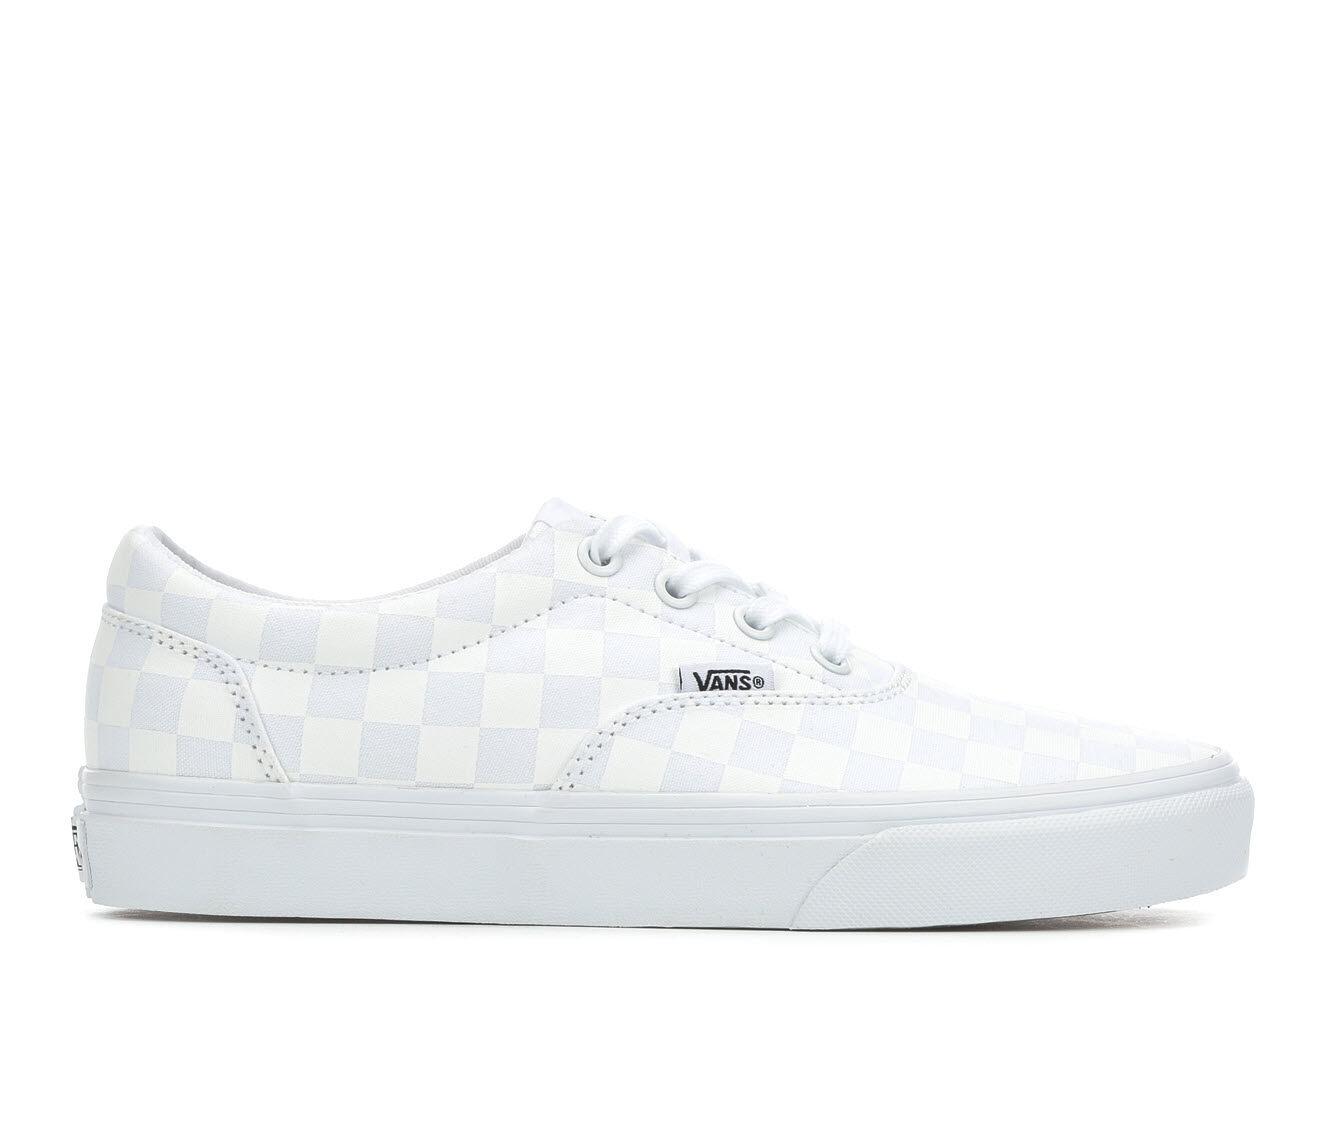 Vans Doheny Skate Shoes | Shoe Carnival